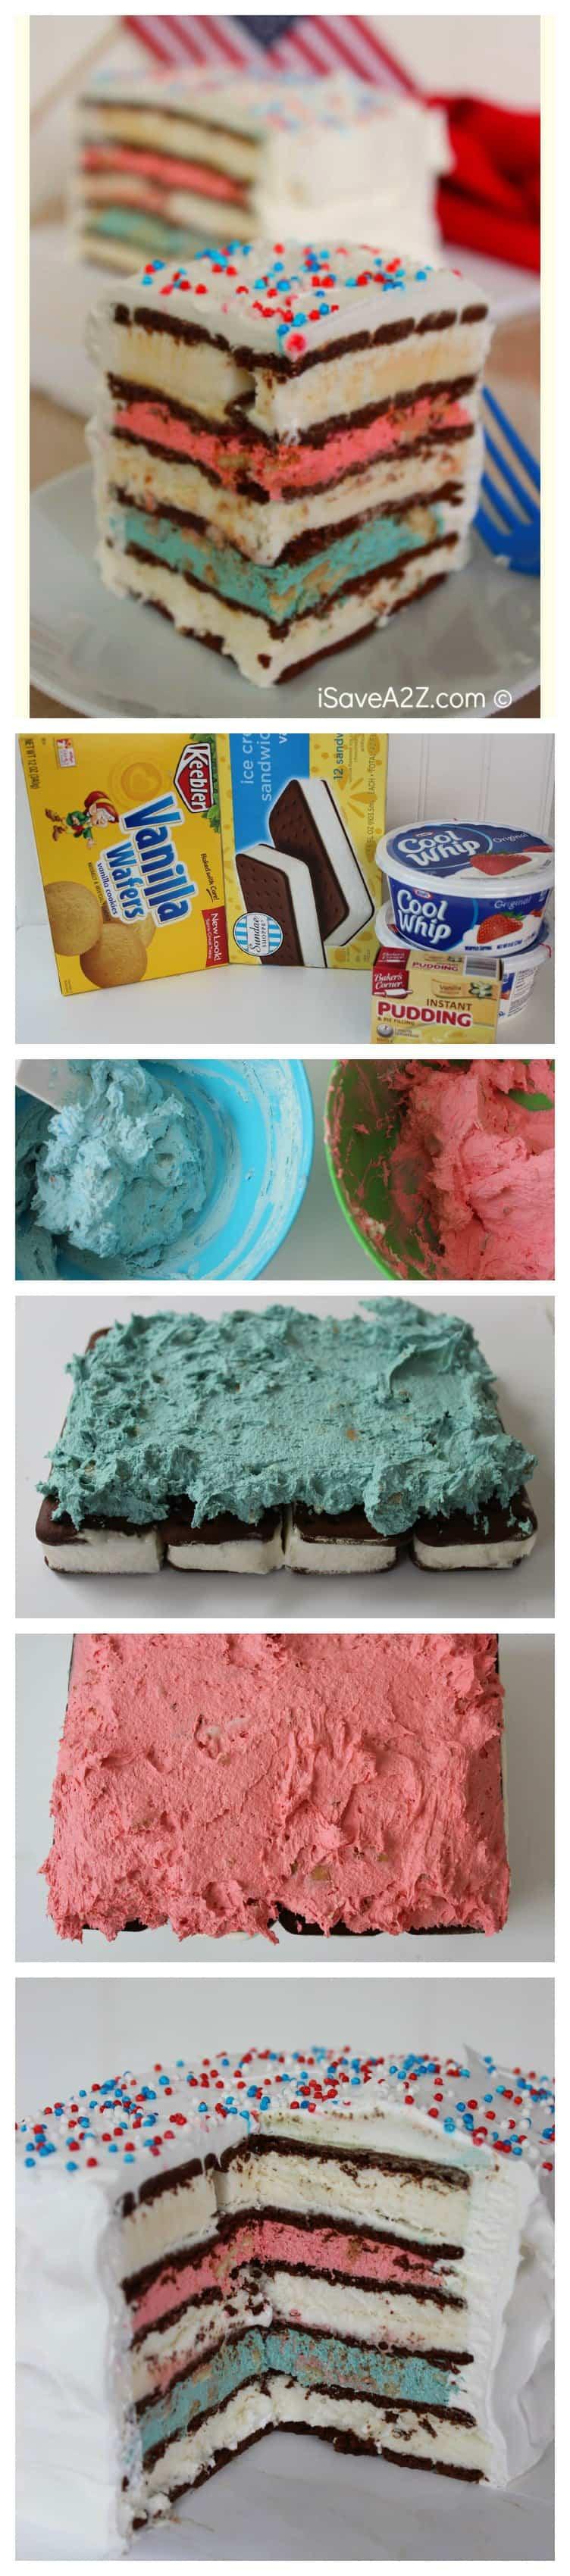 Red White and Blue Ice Cream Sandwich Cake recipe